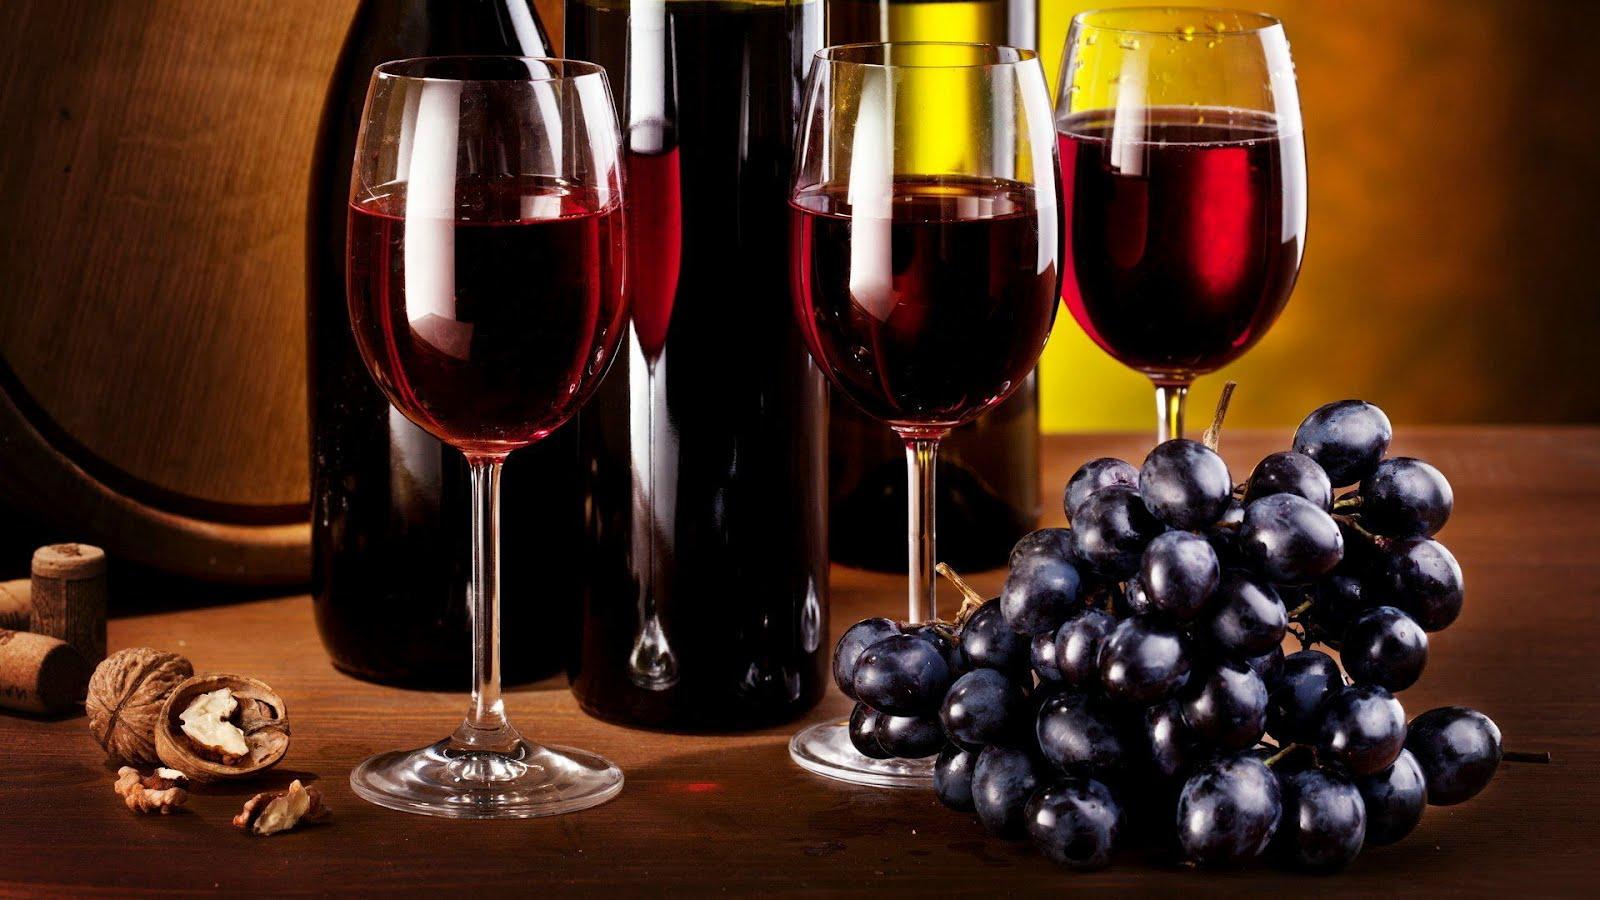 Vino Tinto Y Uvas   Grapes And Wine